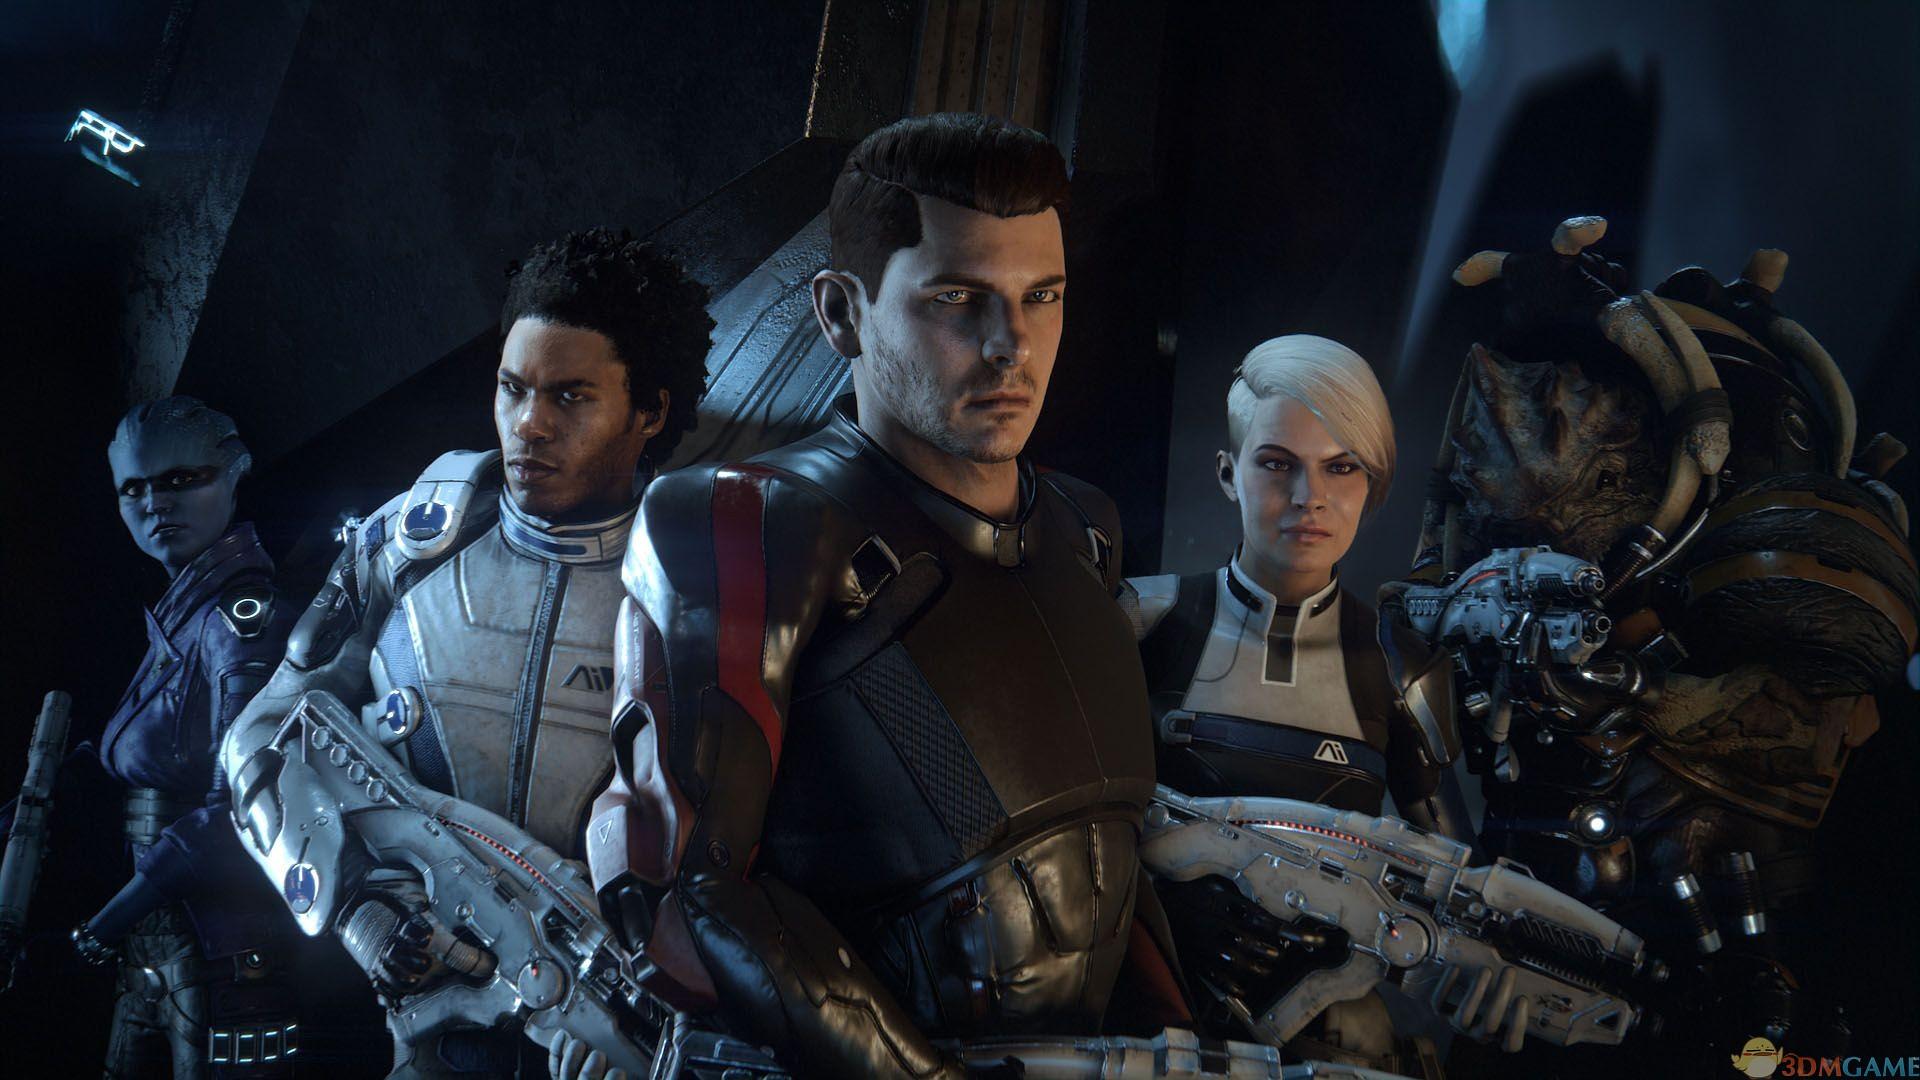 质量效应:仙女座 (Mass Effect:Andromeda)【v1.10豪华版 轩辕简中汉化 补】插图4